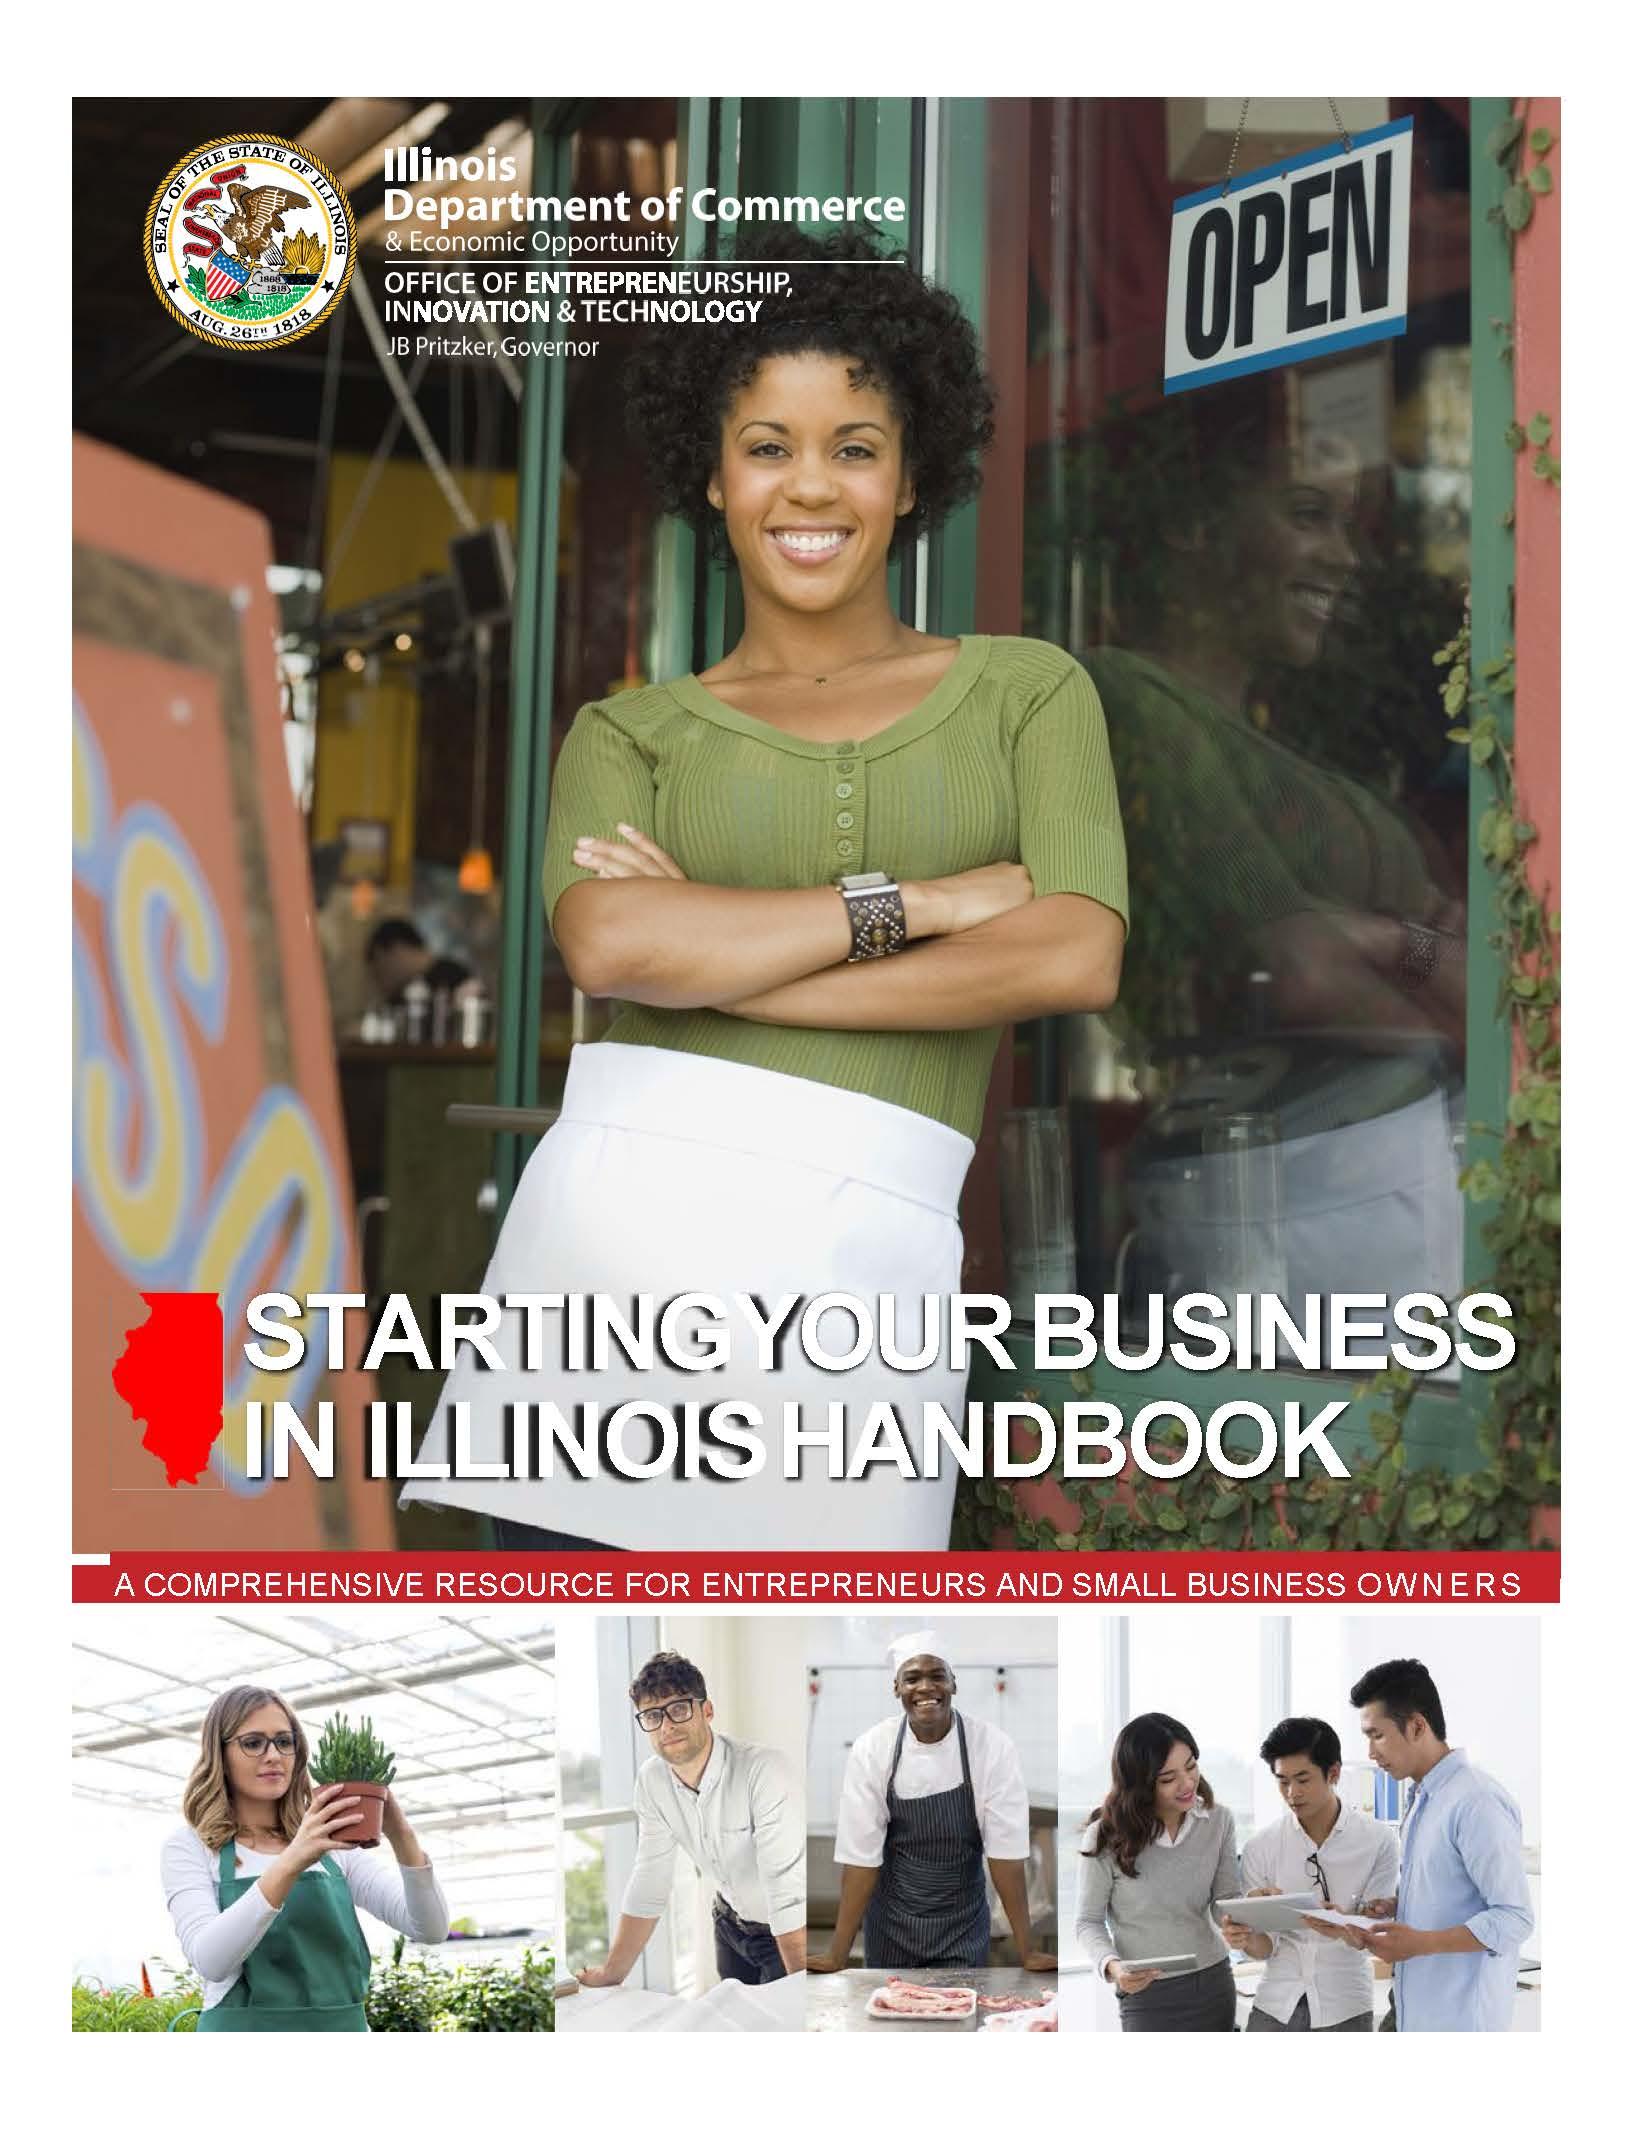 Starting-Your-Business-Handbook-Final-Version-November-2019-cover.jpg